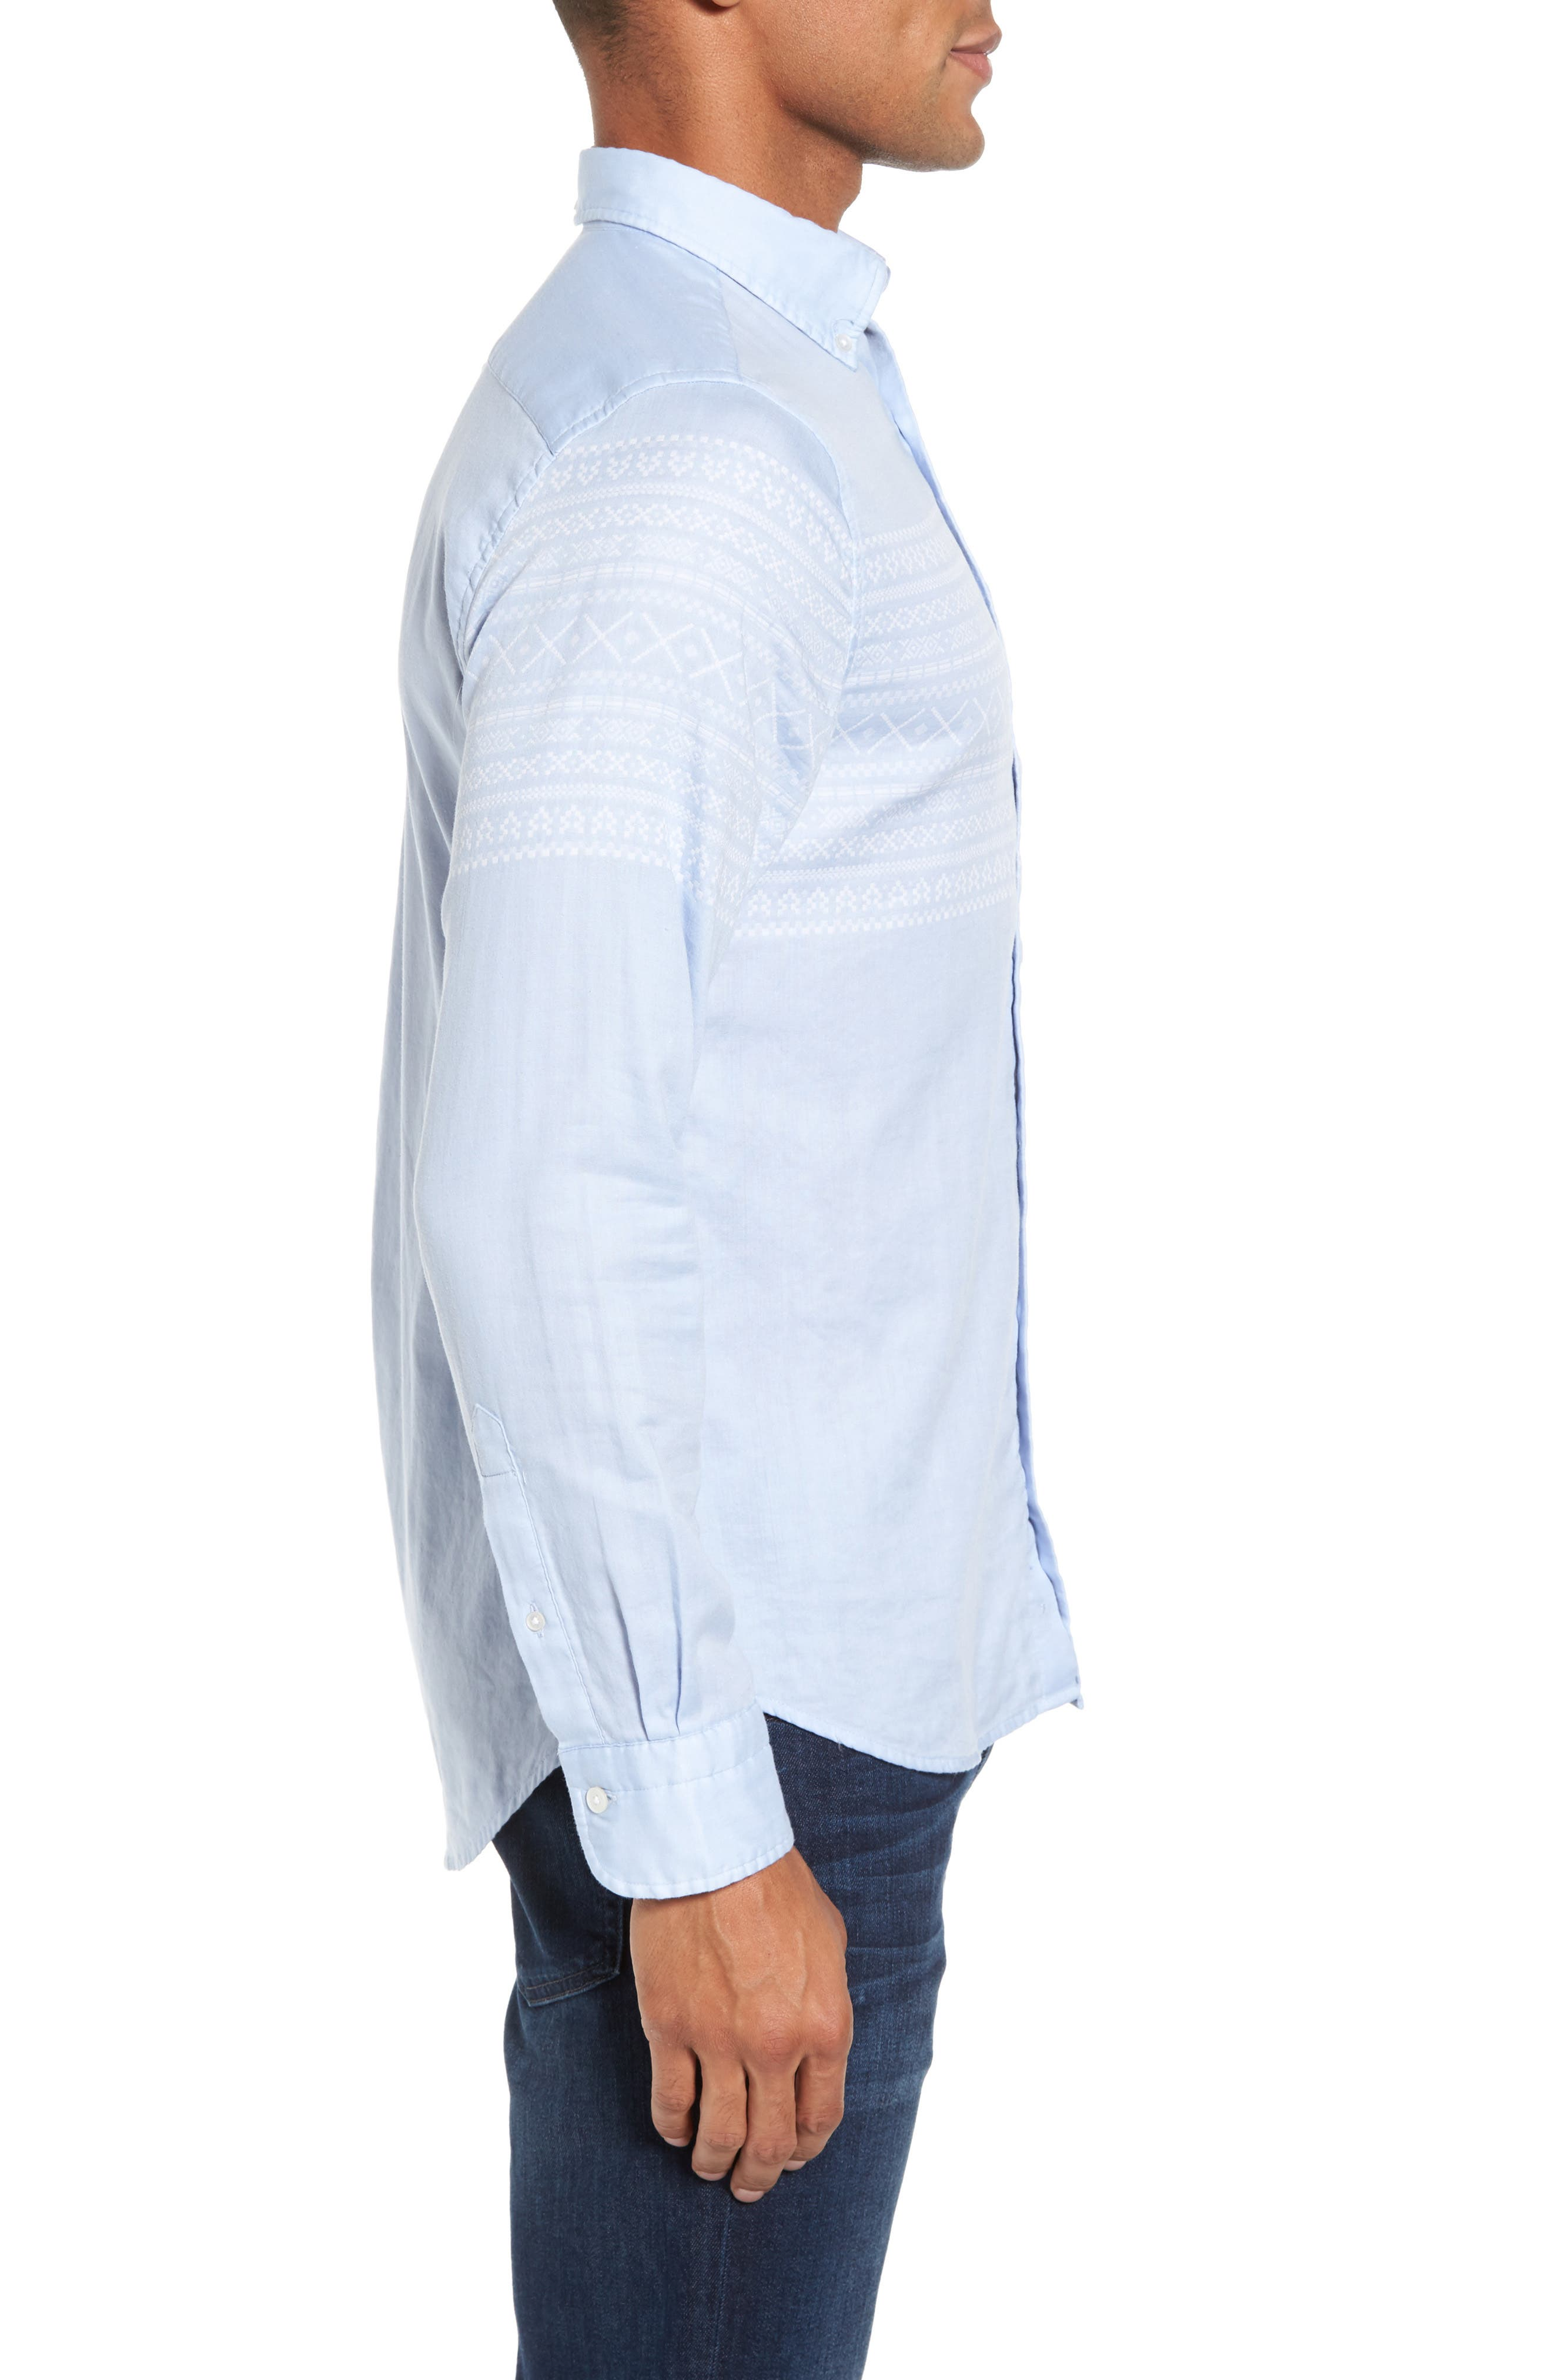 02 Extra Slim Fit Fair Isle Print Sport Shirt,                             Alternate thumbnail 3, color,                             Hamptons Blue